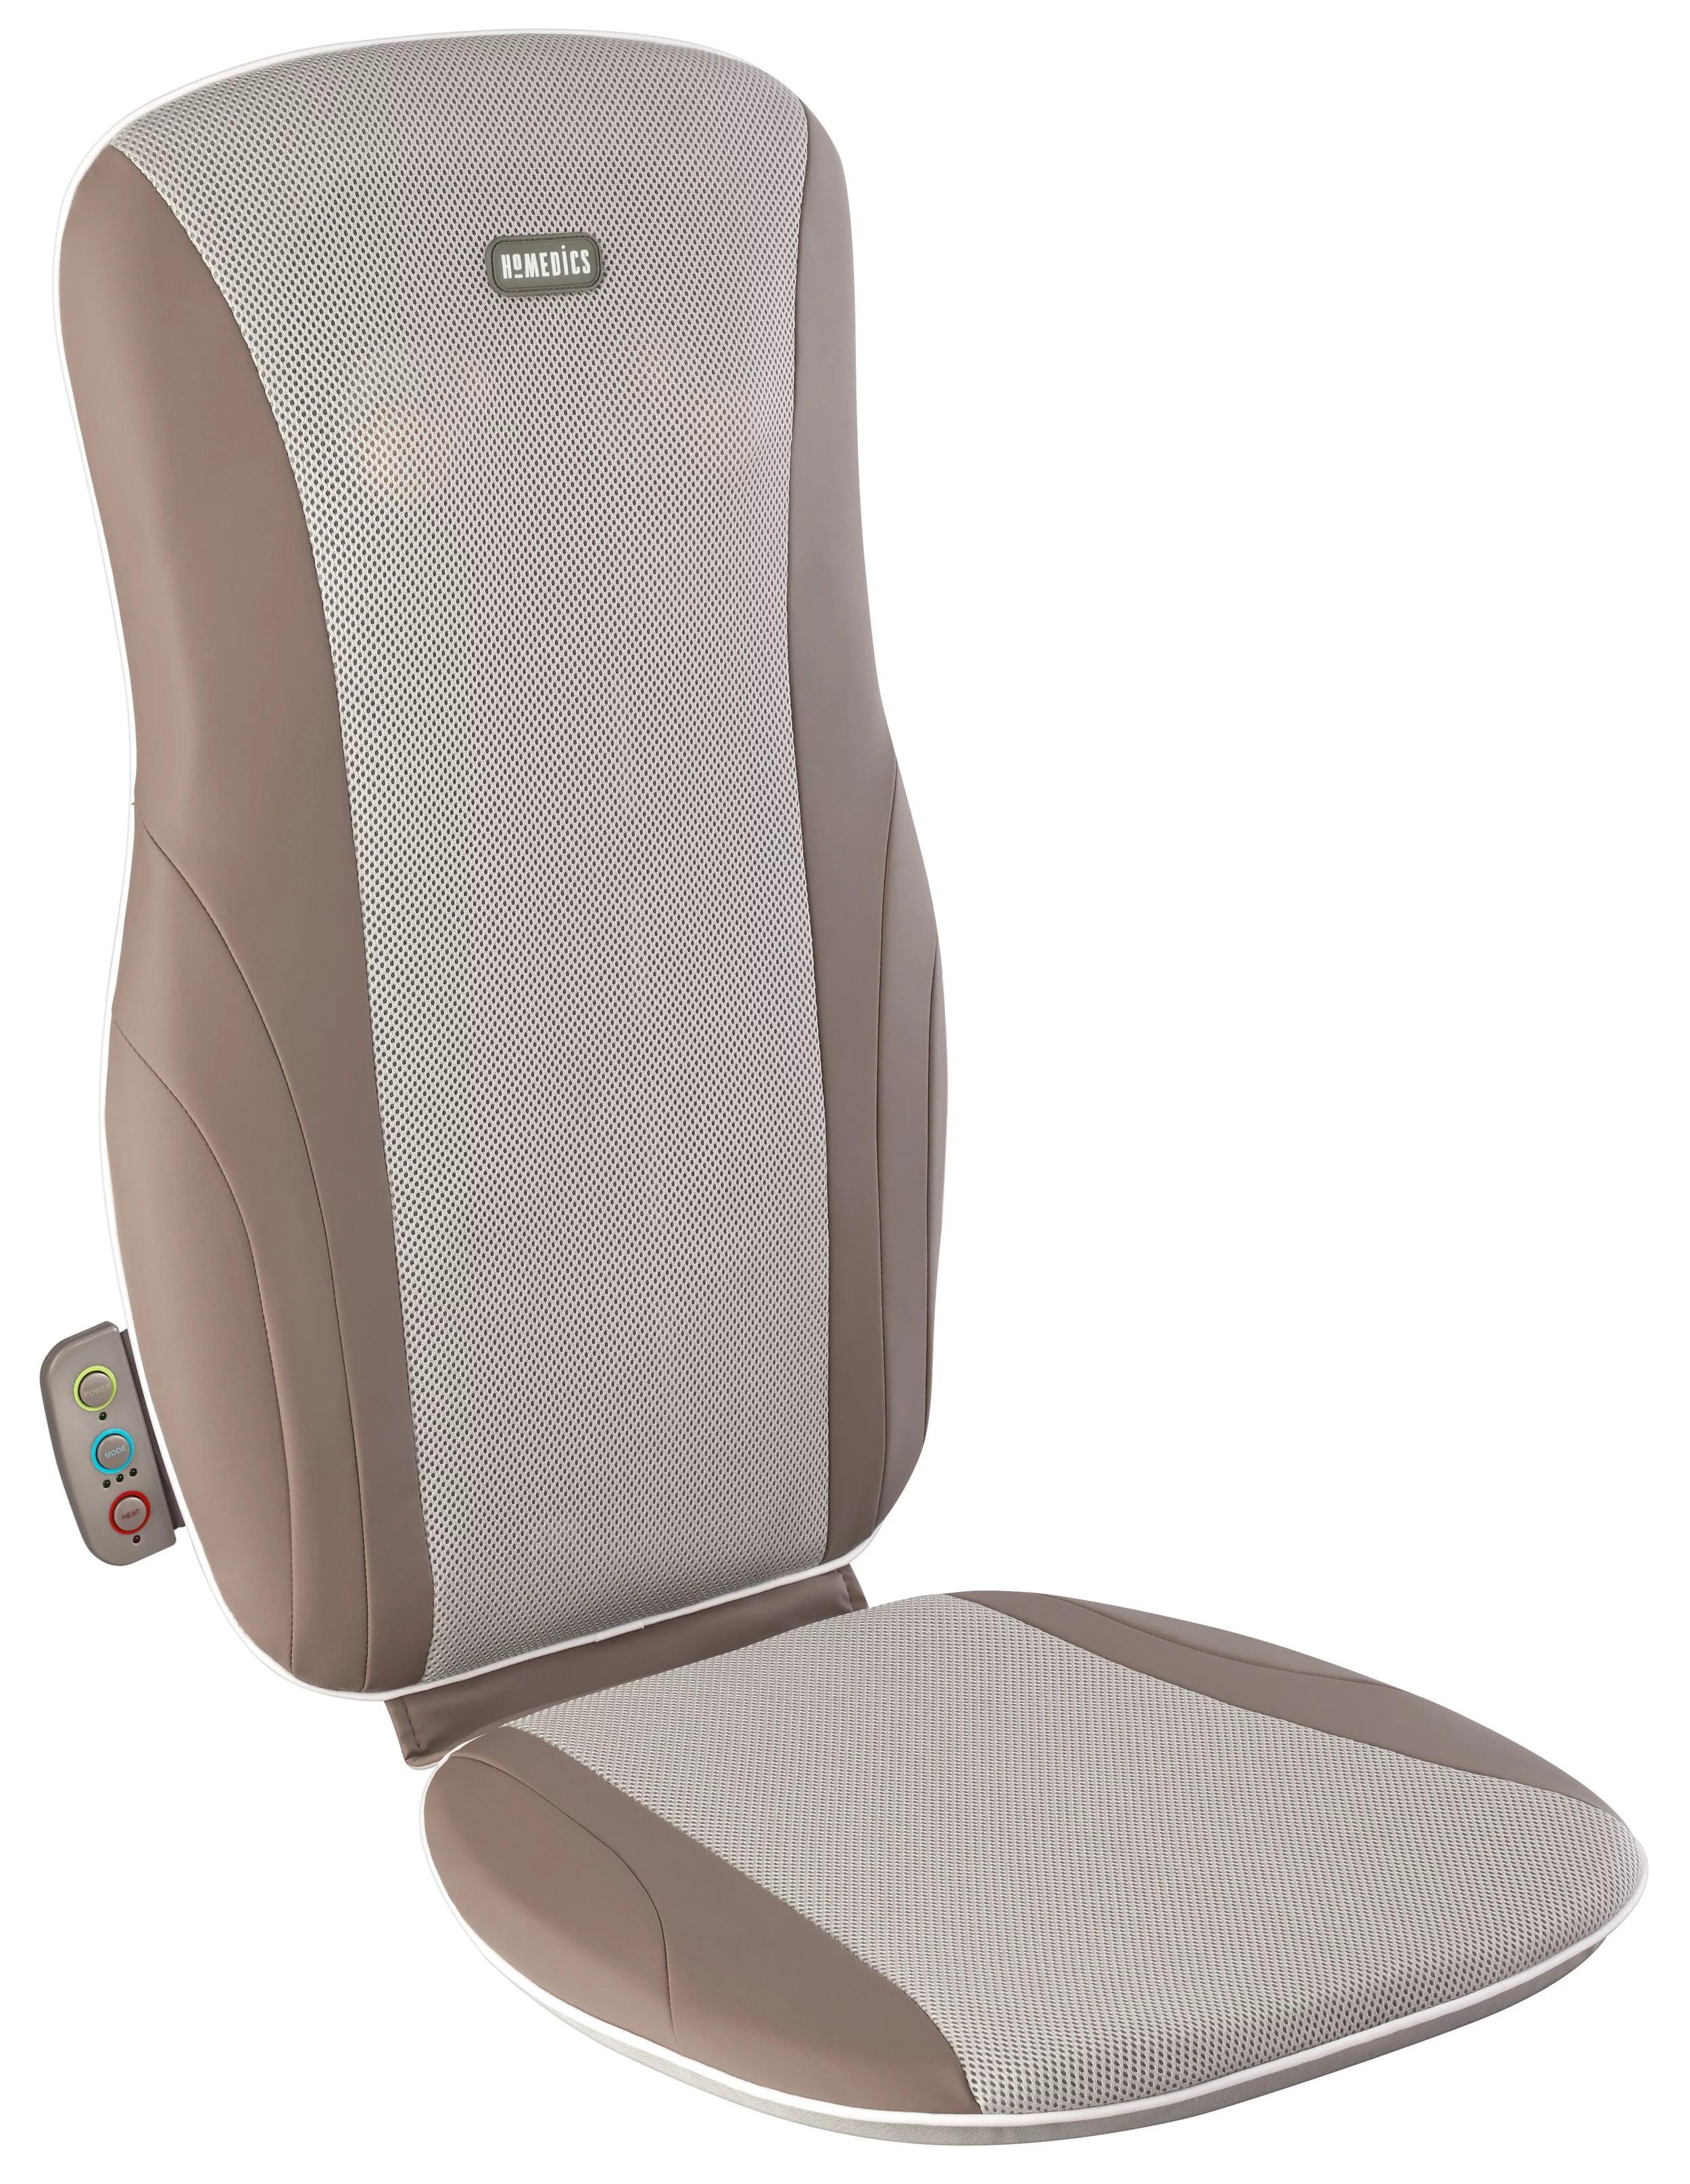 homedics thera p seat cushion massager with heat deep kneading shiatsu technology for back walmart com